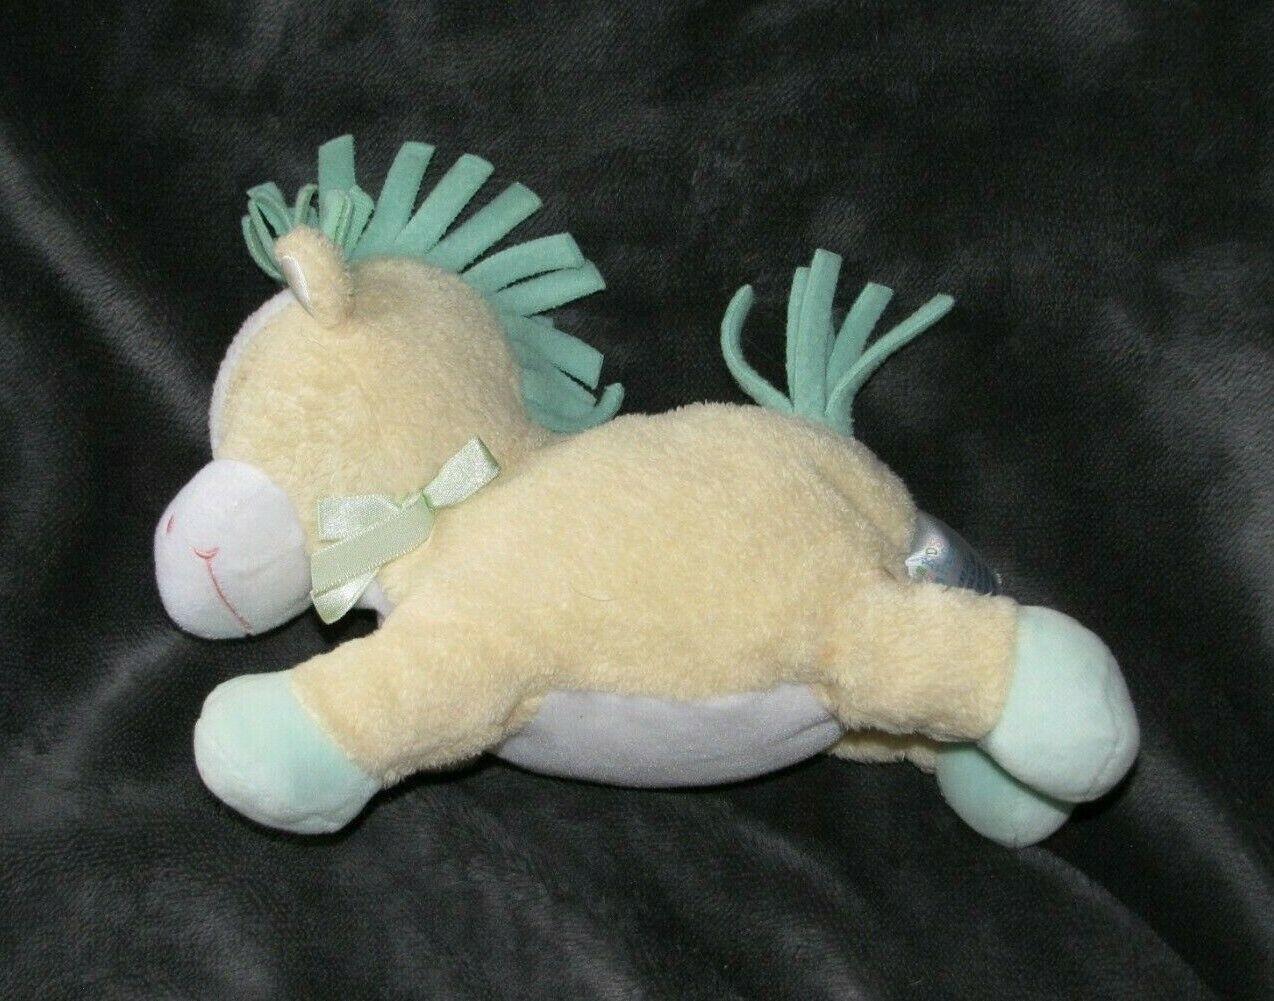 "9"" BABY KIDS PREFERRED YELLOW HORSE PONY RATTLE STUFFED ANIMAL PLUSH TOY LOVEY"